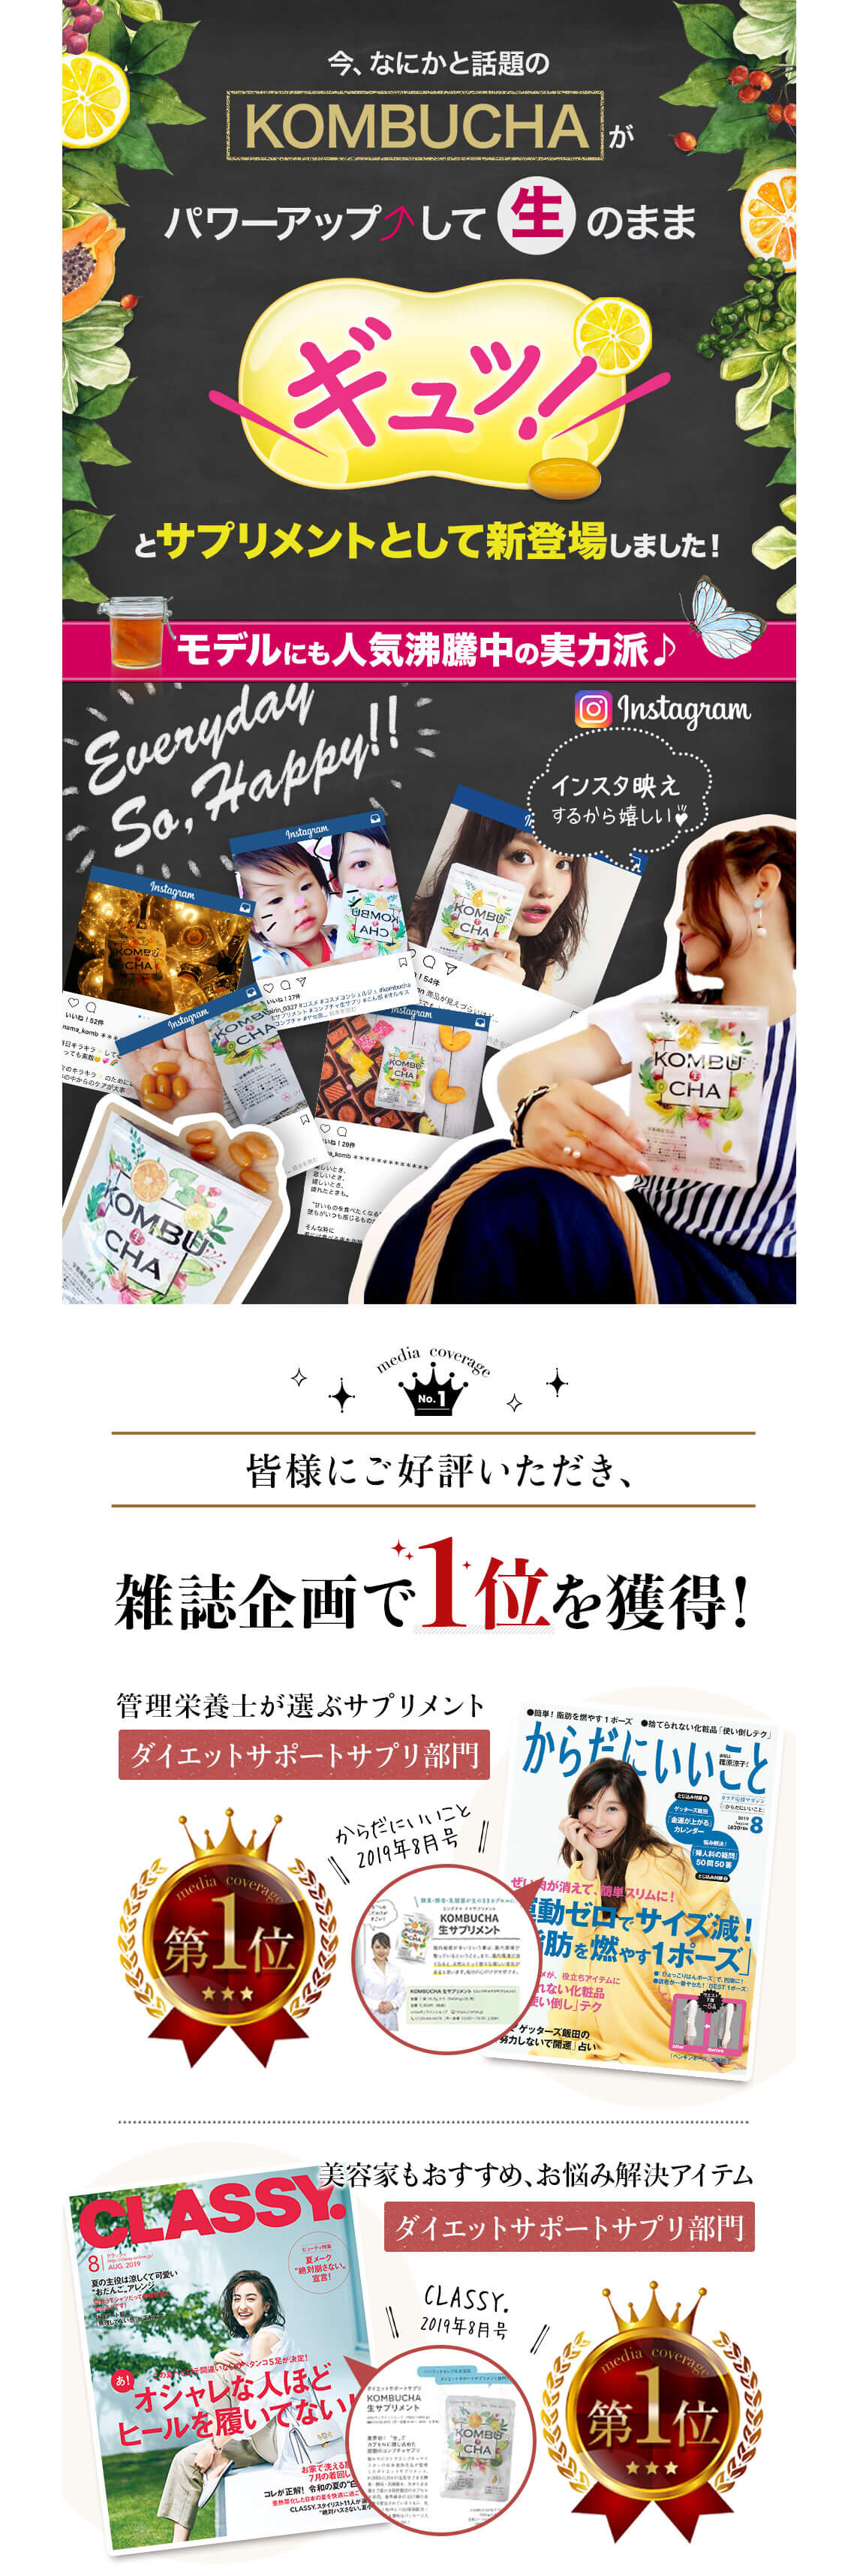 KOMBUCHA生サプリメント,モデルに人気,instagram